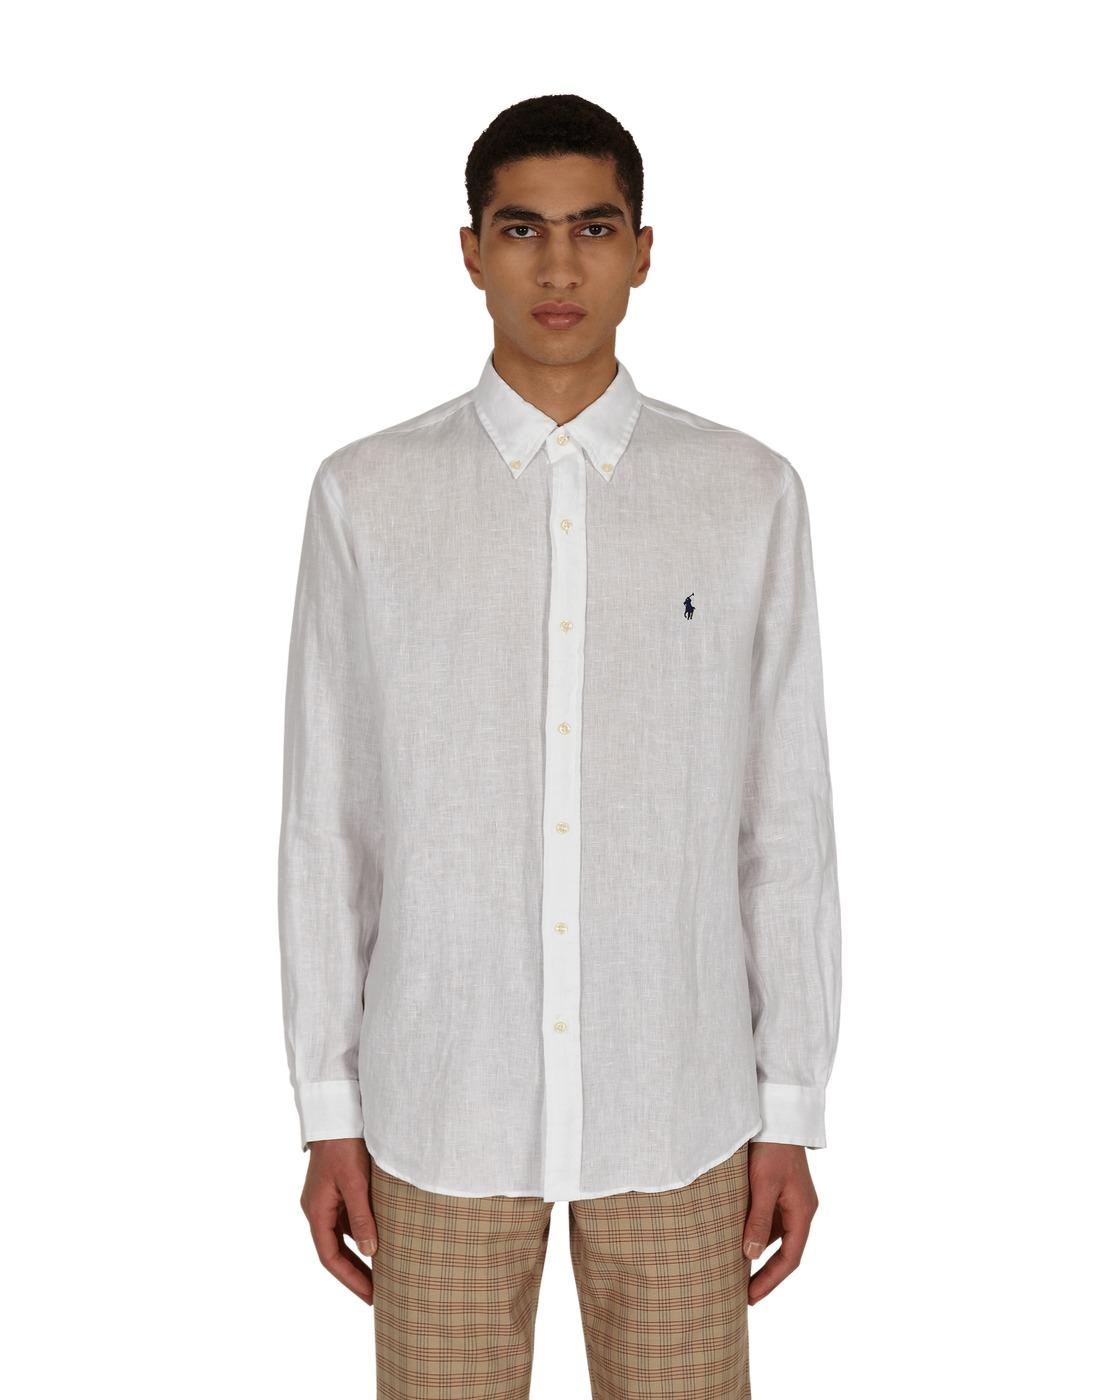 Photo: Polo Ralph Lauren Custom Fit Linen Shirt White